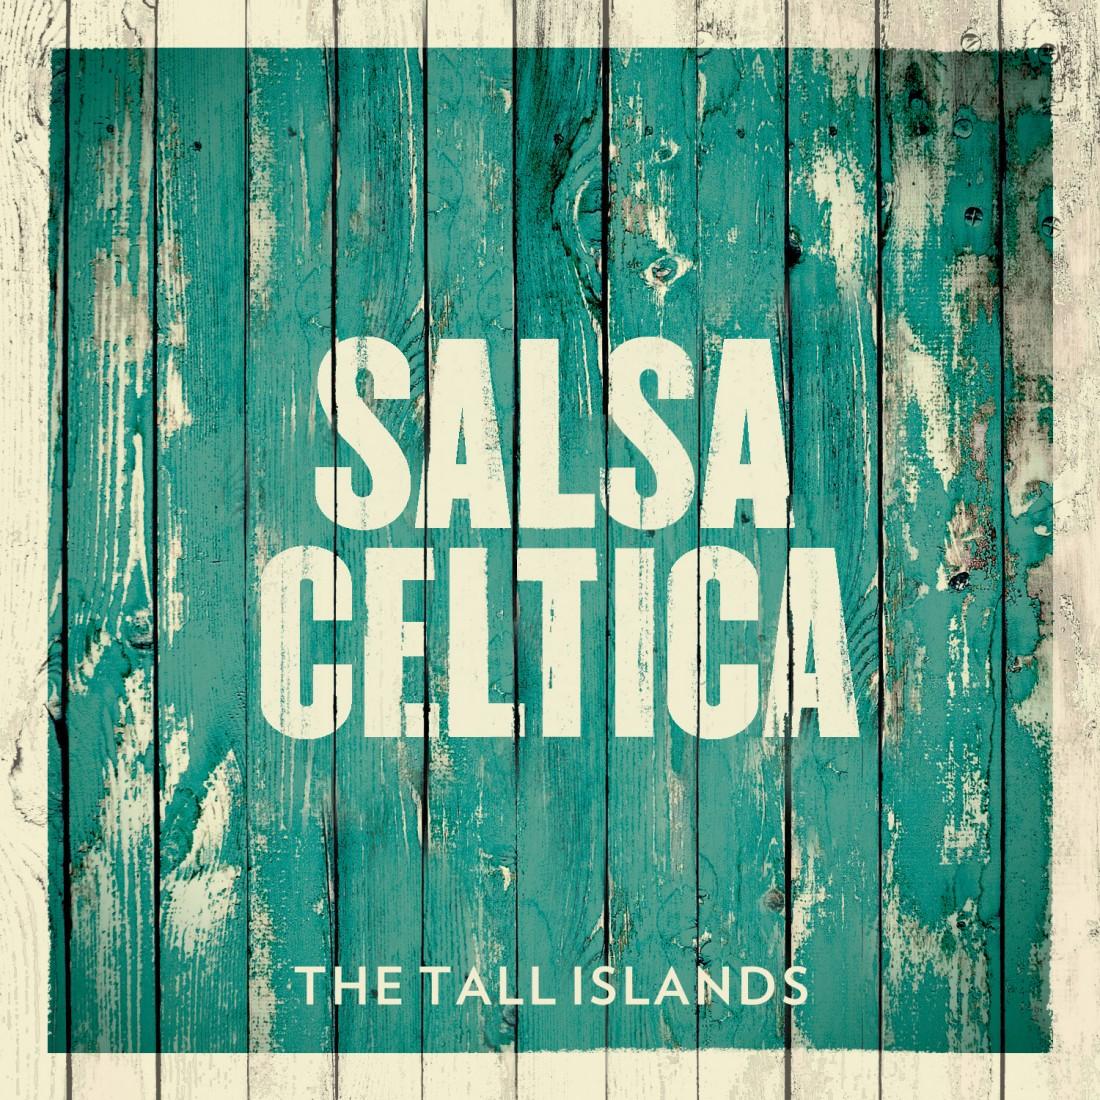 The Tall Islands - Salsa Celtica